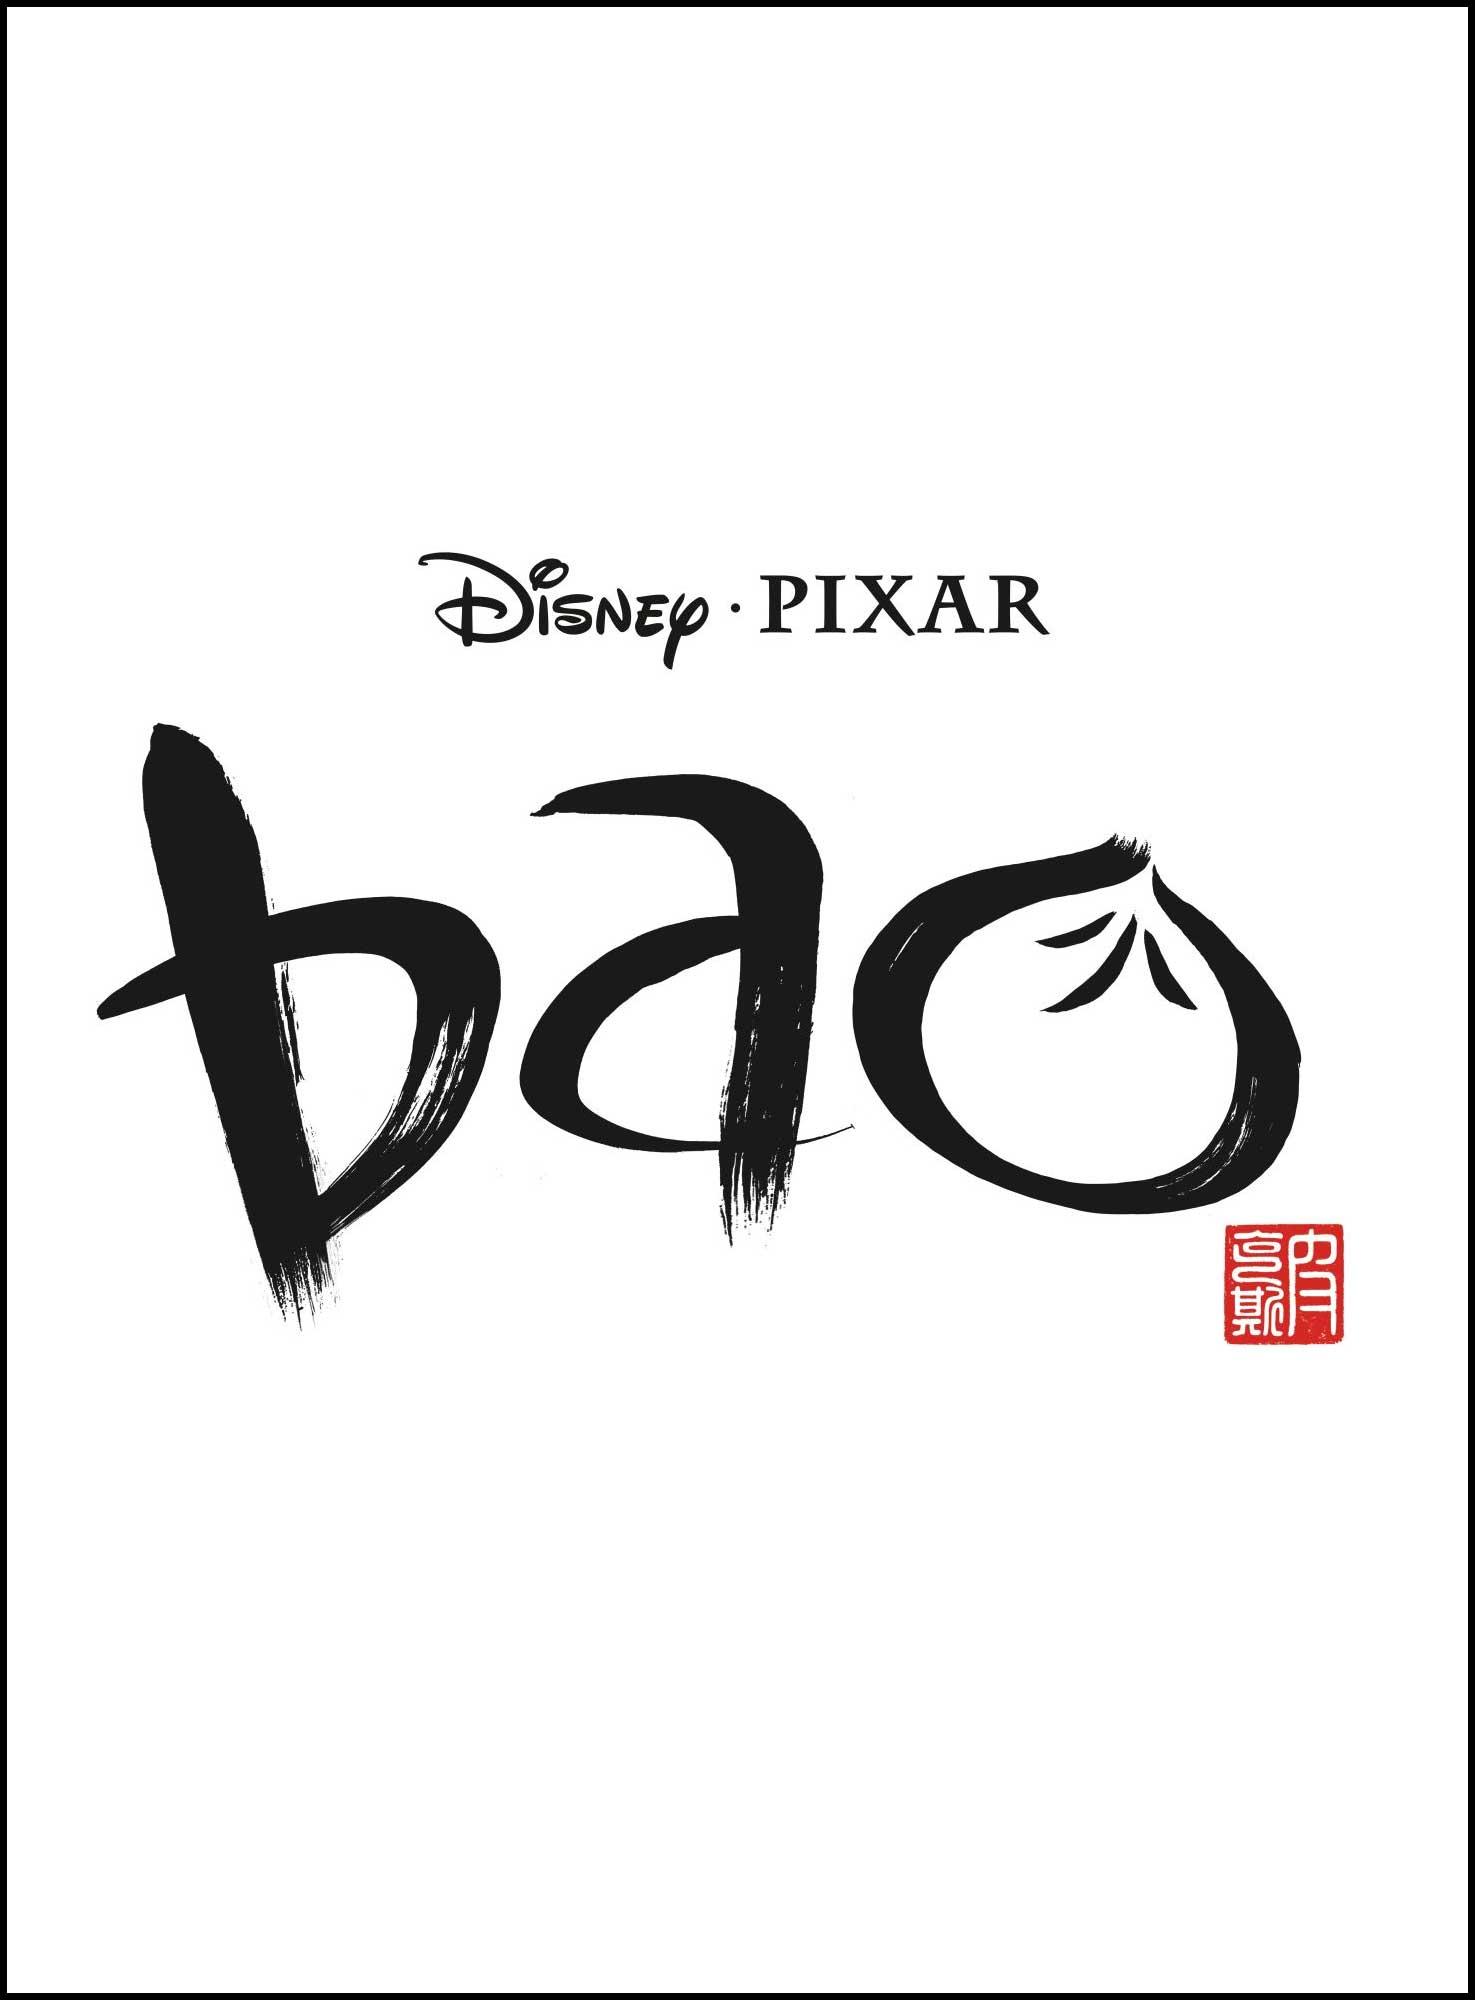 affiche poster bao pixar disney